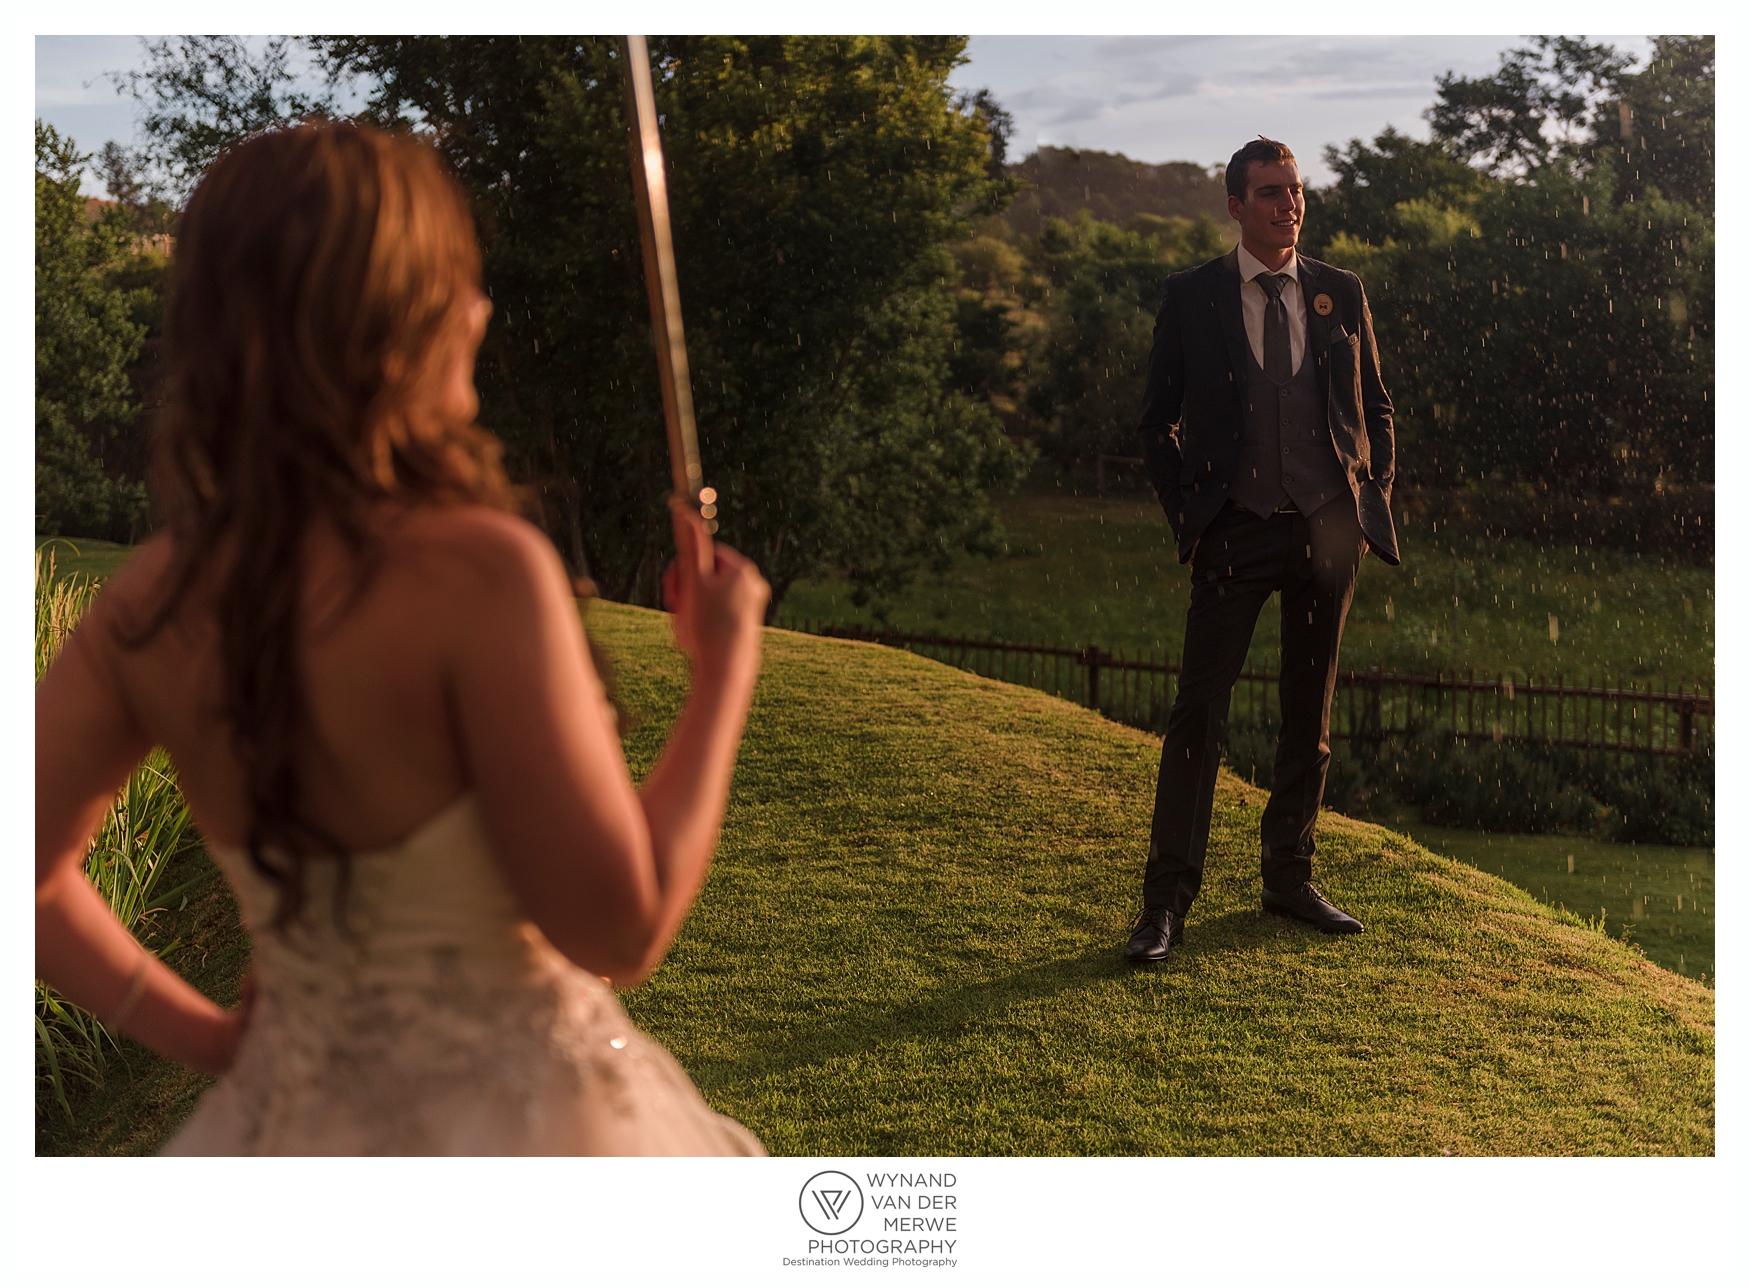 Wynandvandermerwe ryan natalia wedding photography cradle valley guesthouse gauteng-497.jpg